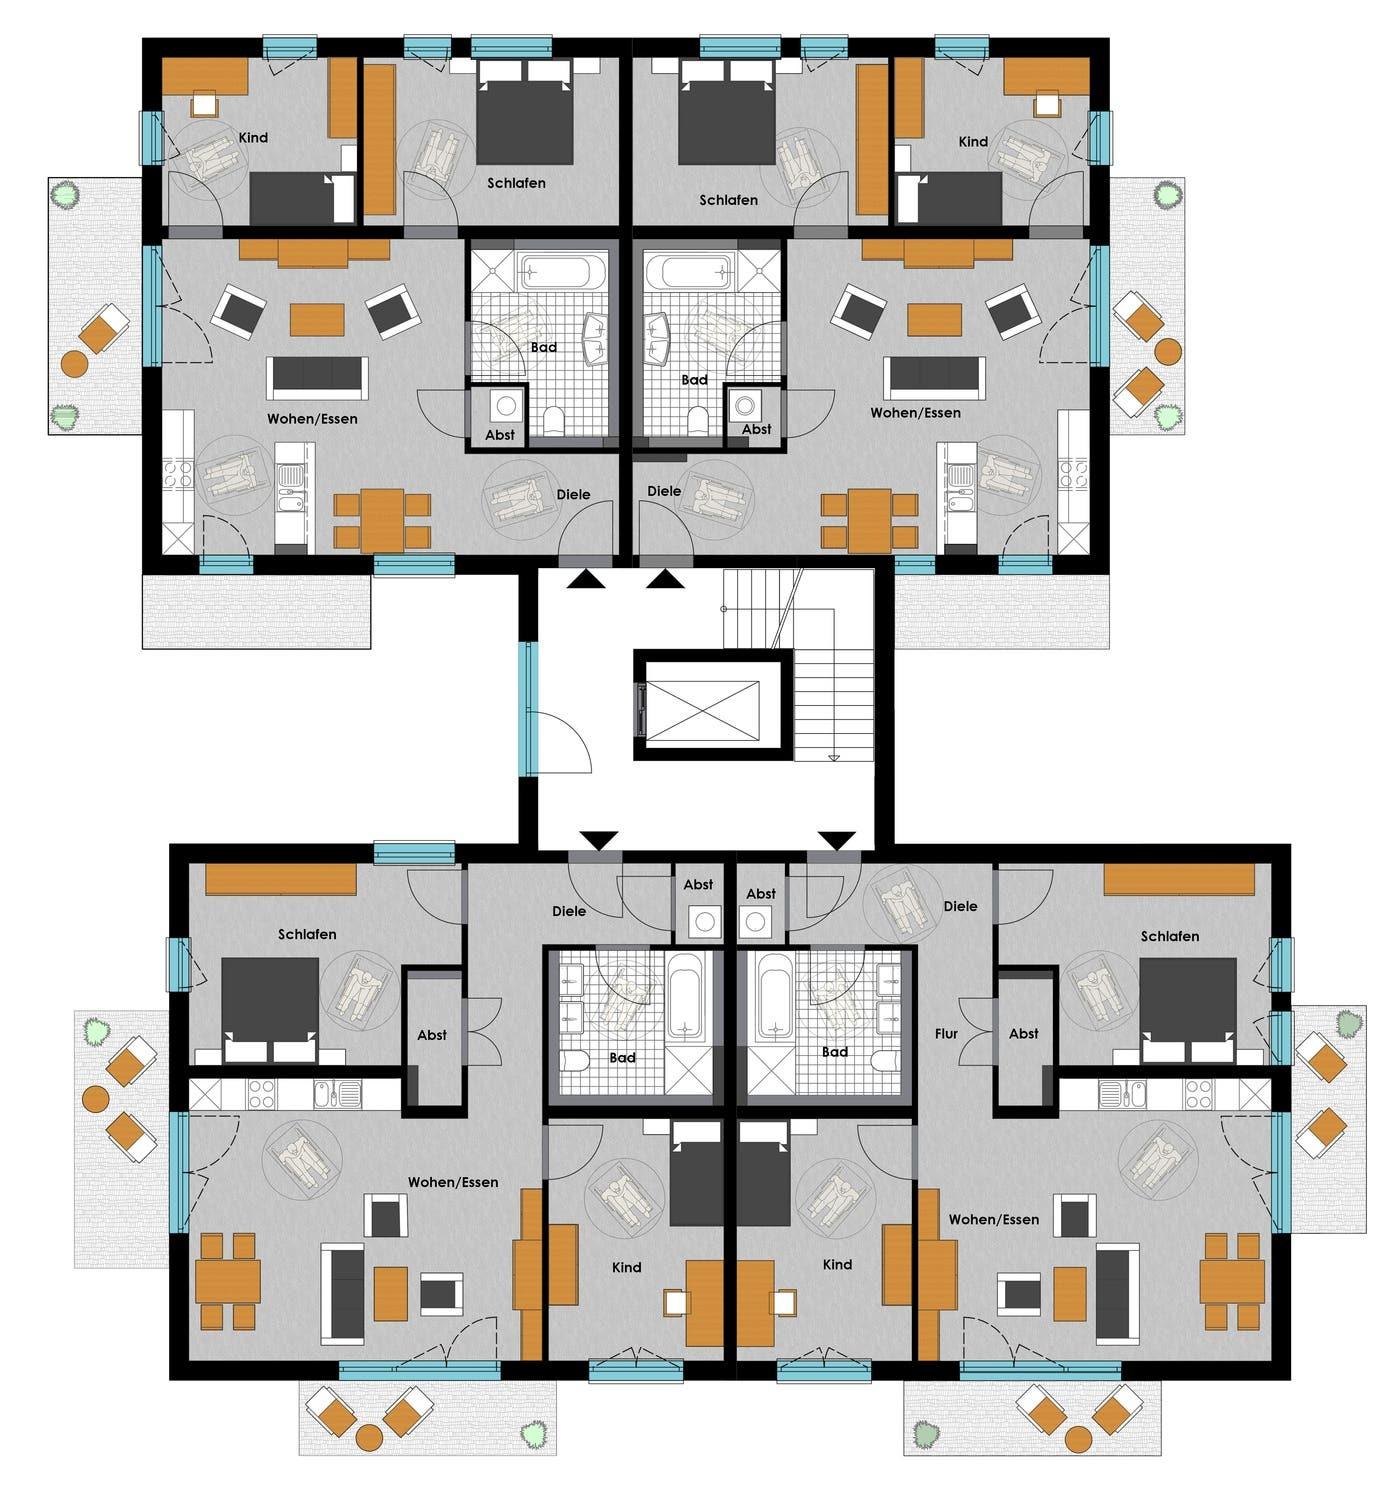 floorplan-2d-coloring-apartmen.jpg